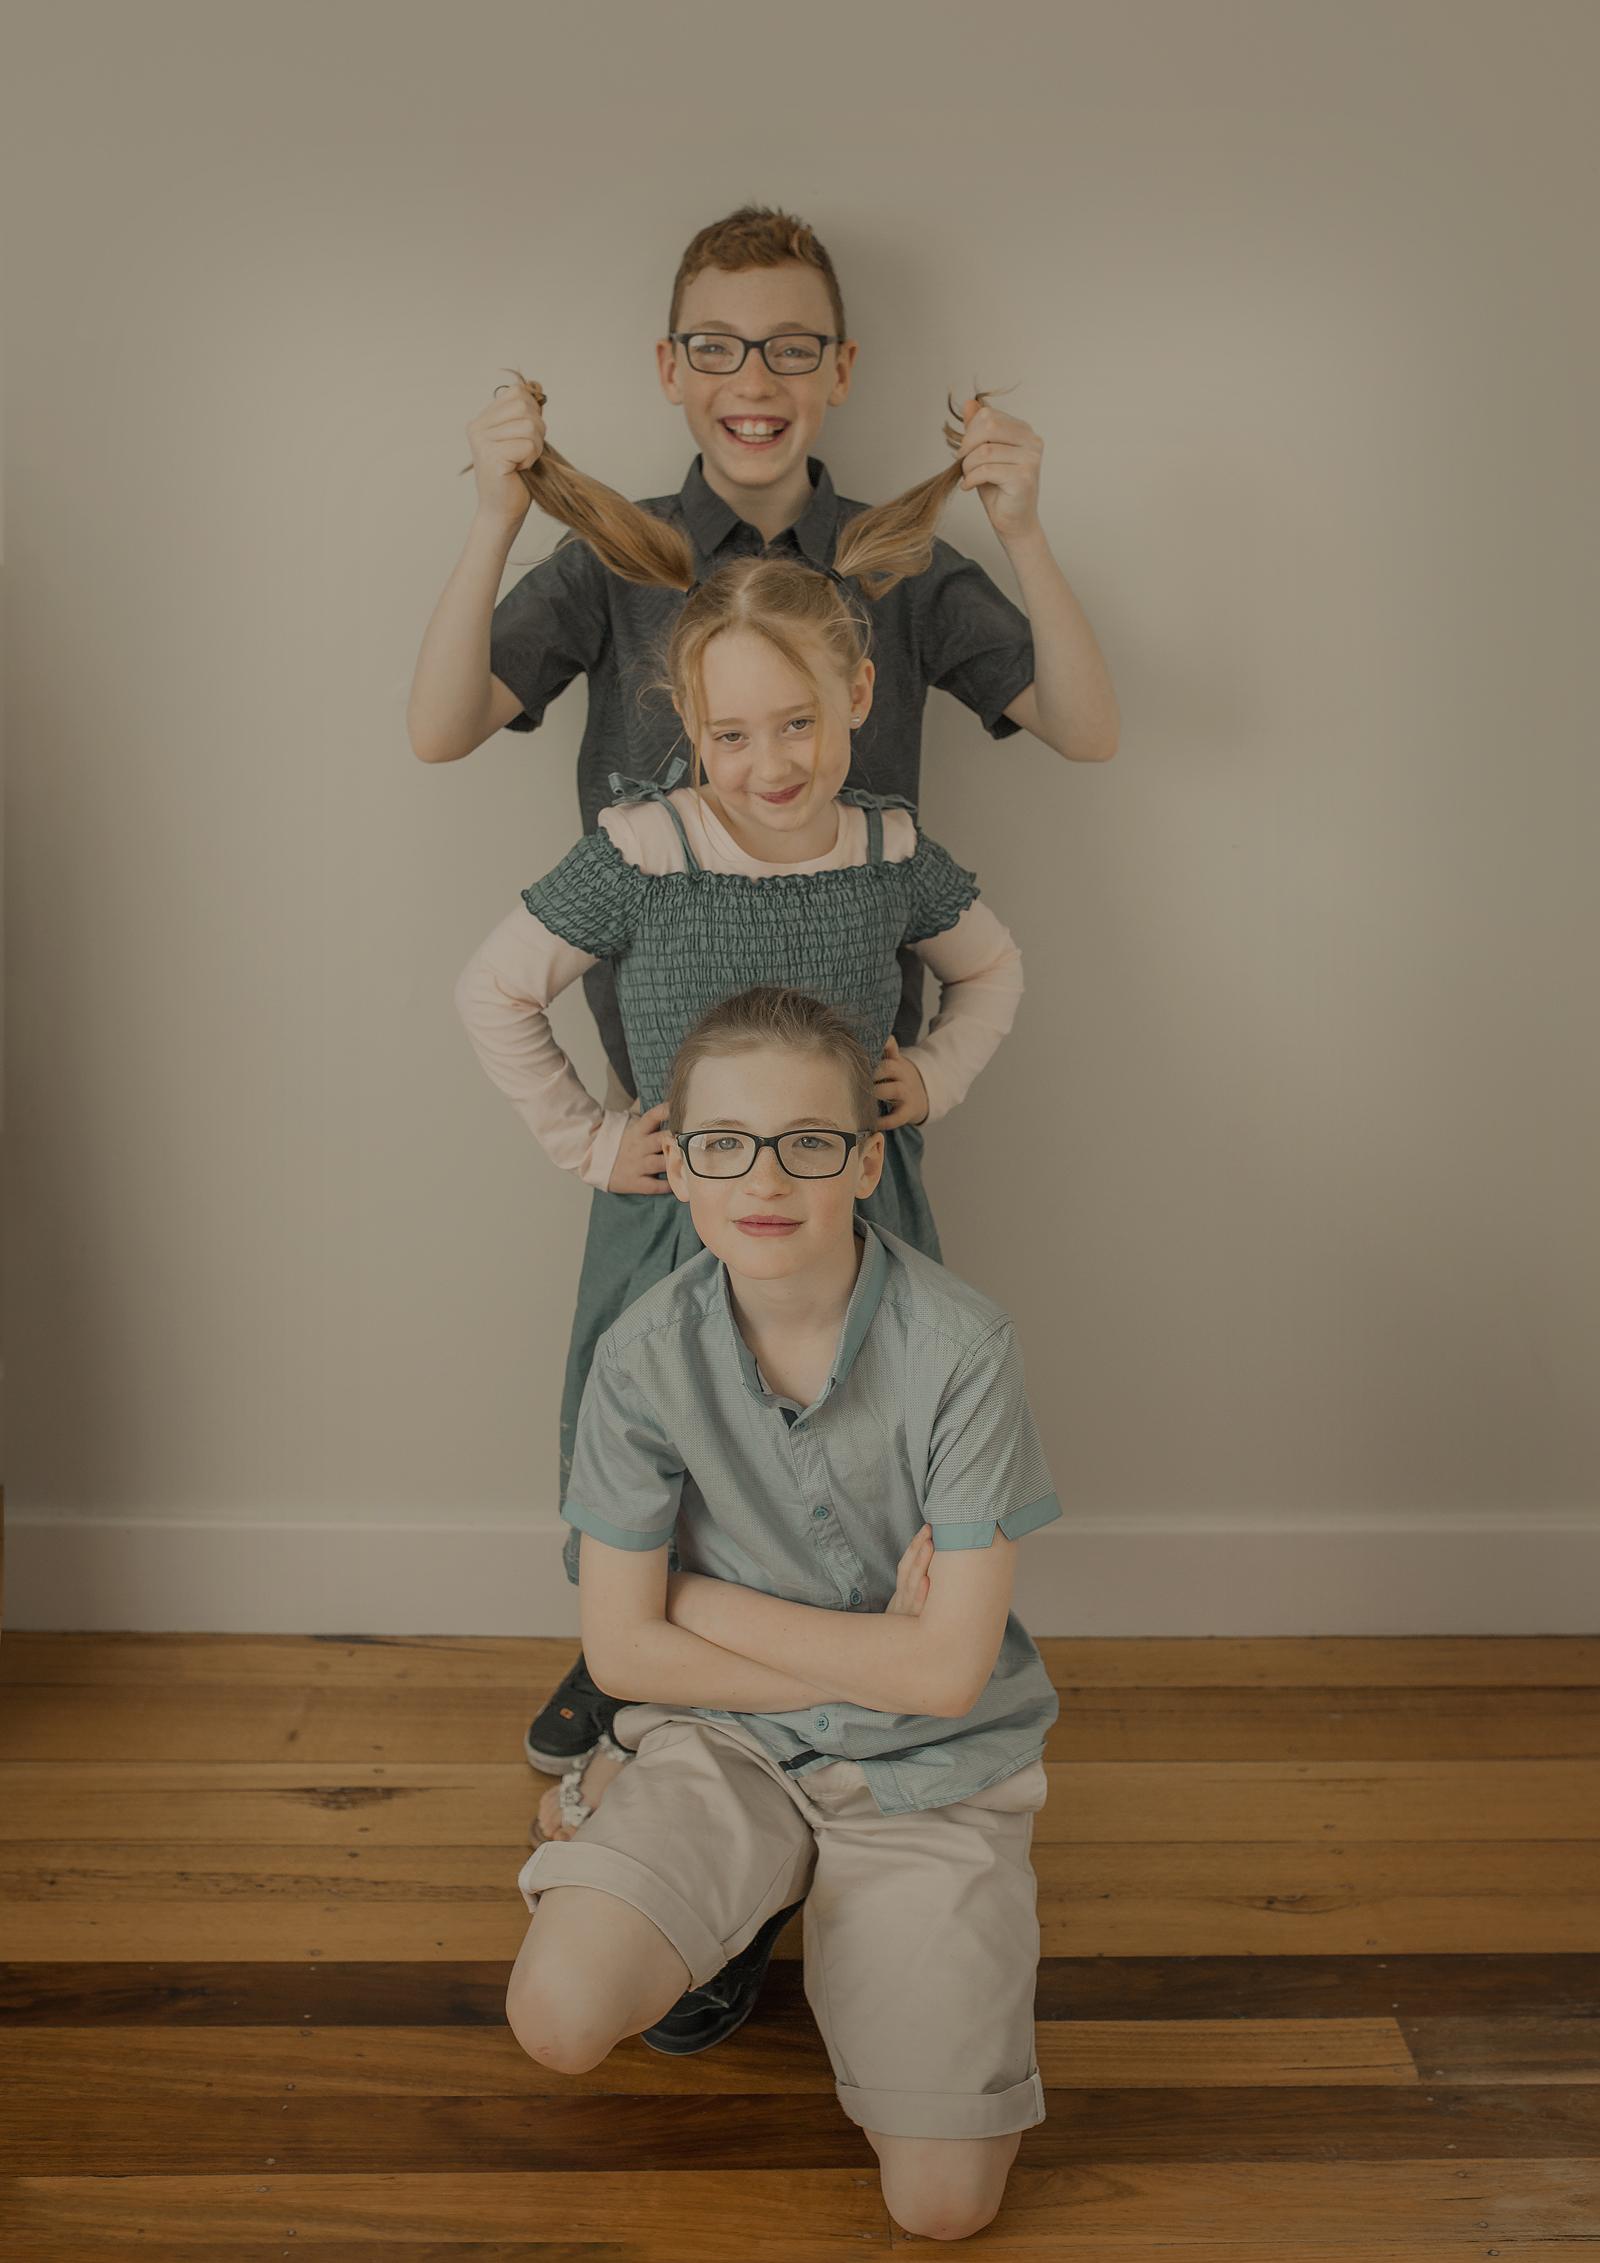 Cheeky family photos!